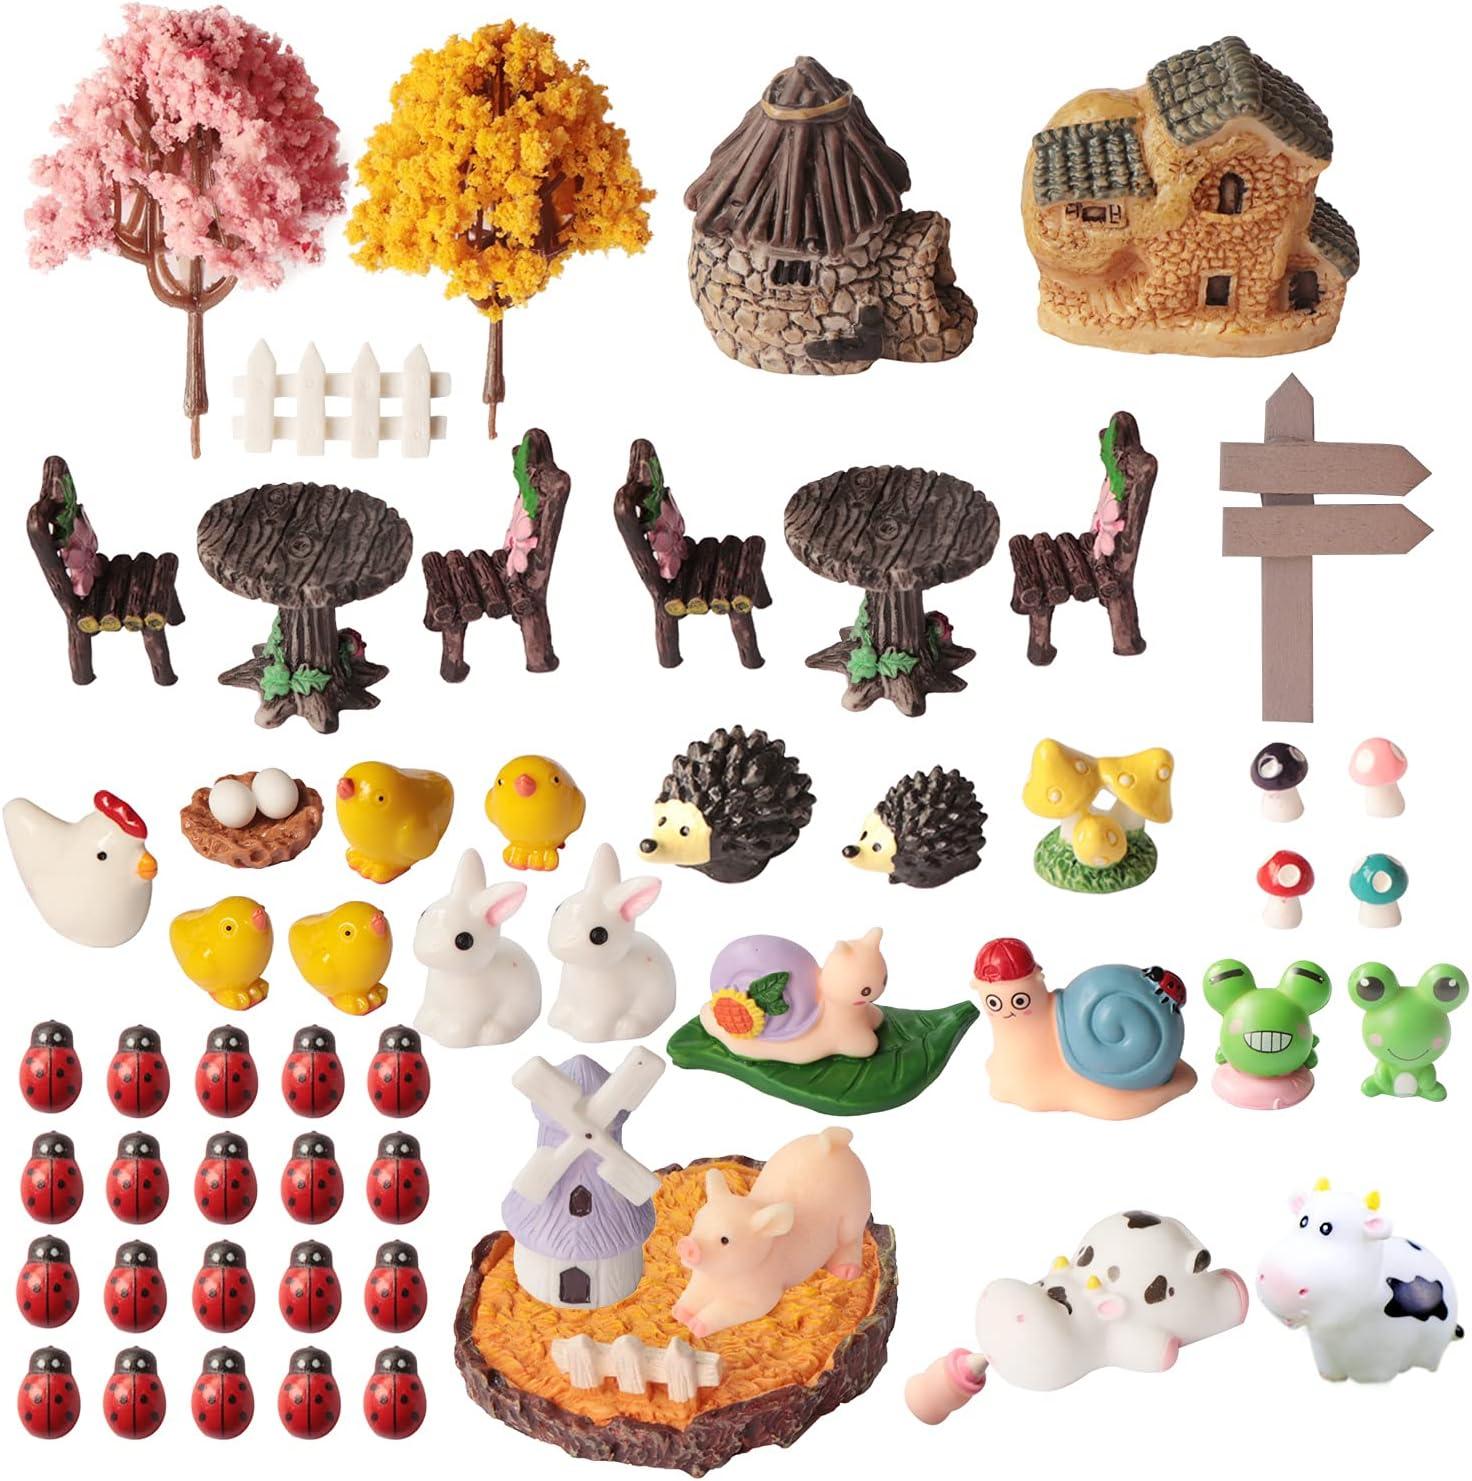 SPWOLFRT 58 Pieces Fairy Garden Accessories, Fairy Garden Kit, Fairy Garden Animals, Miniature Figurines, Micro Landscape Ornaments Kit, Garden DIY Kit, Environmental Resin (58)